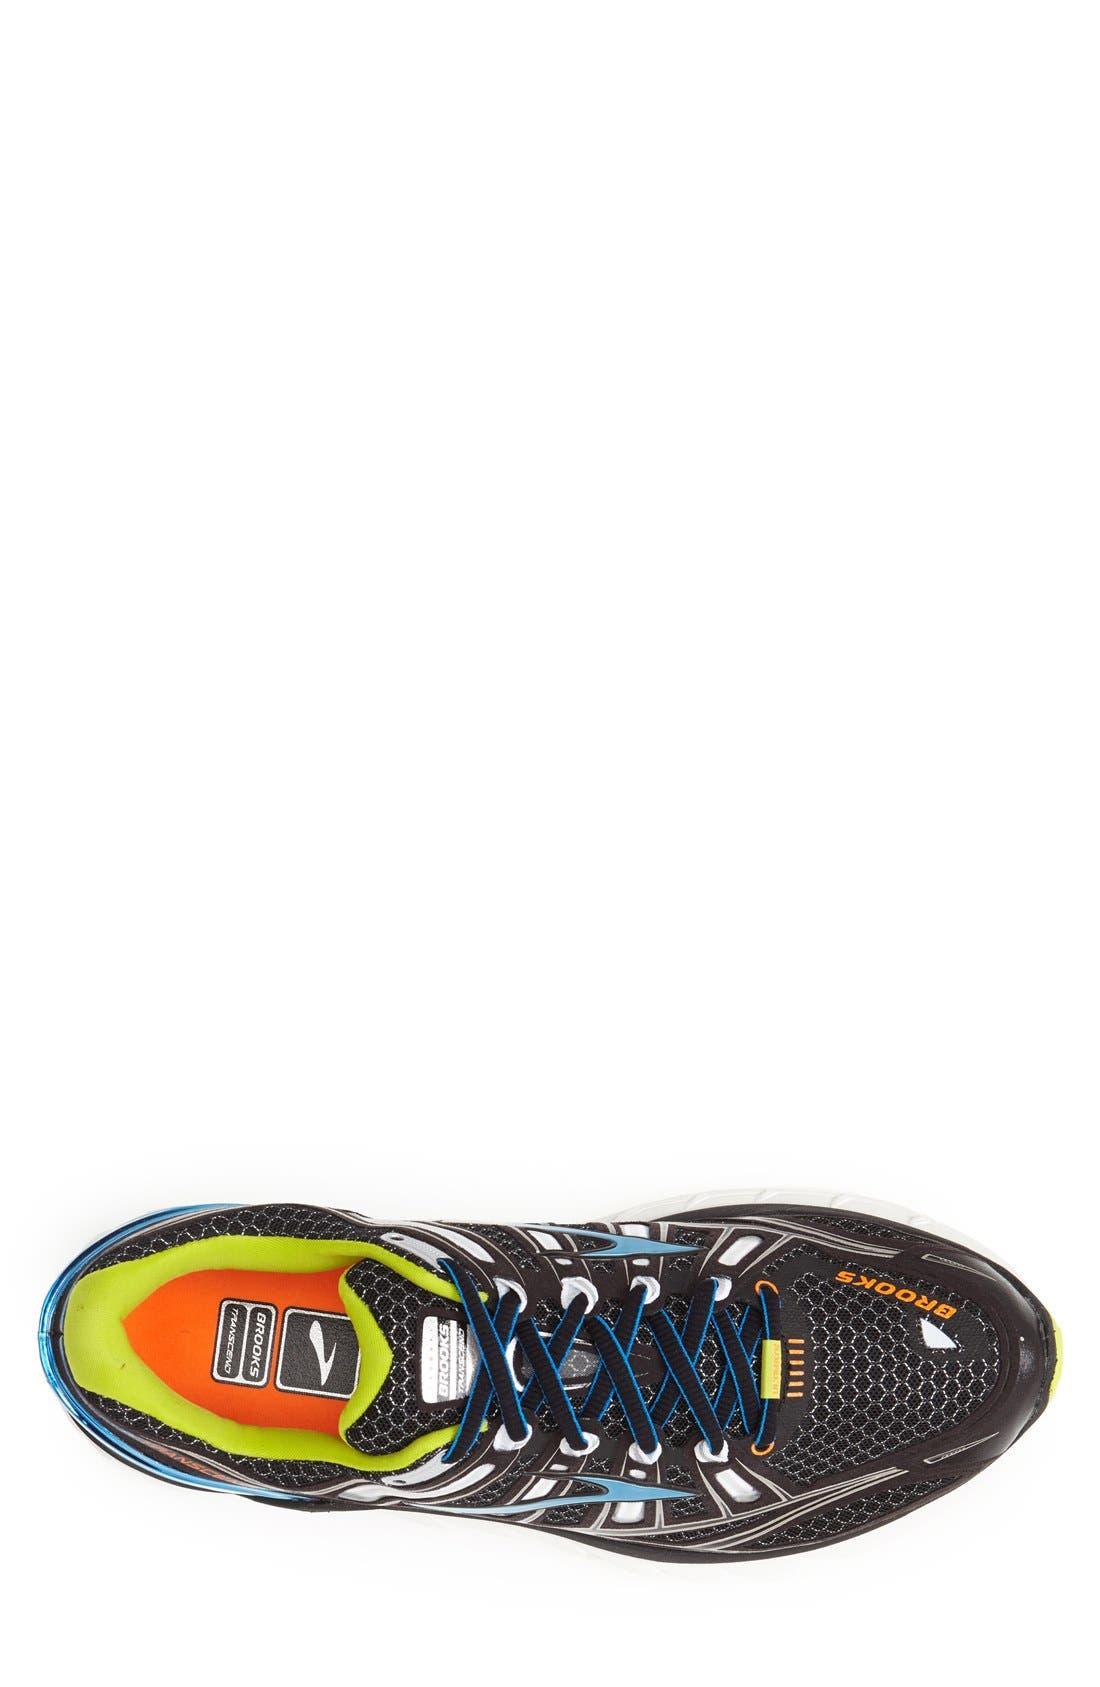 Alternate Image 3  - Brooks 'Transcend' Running Shoe (Men)